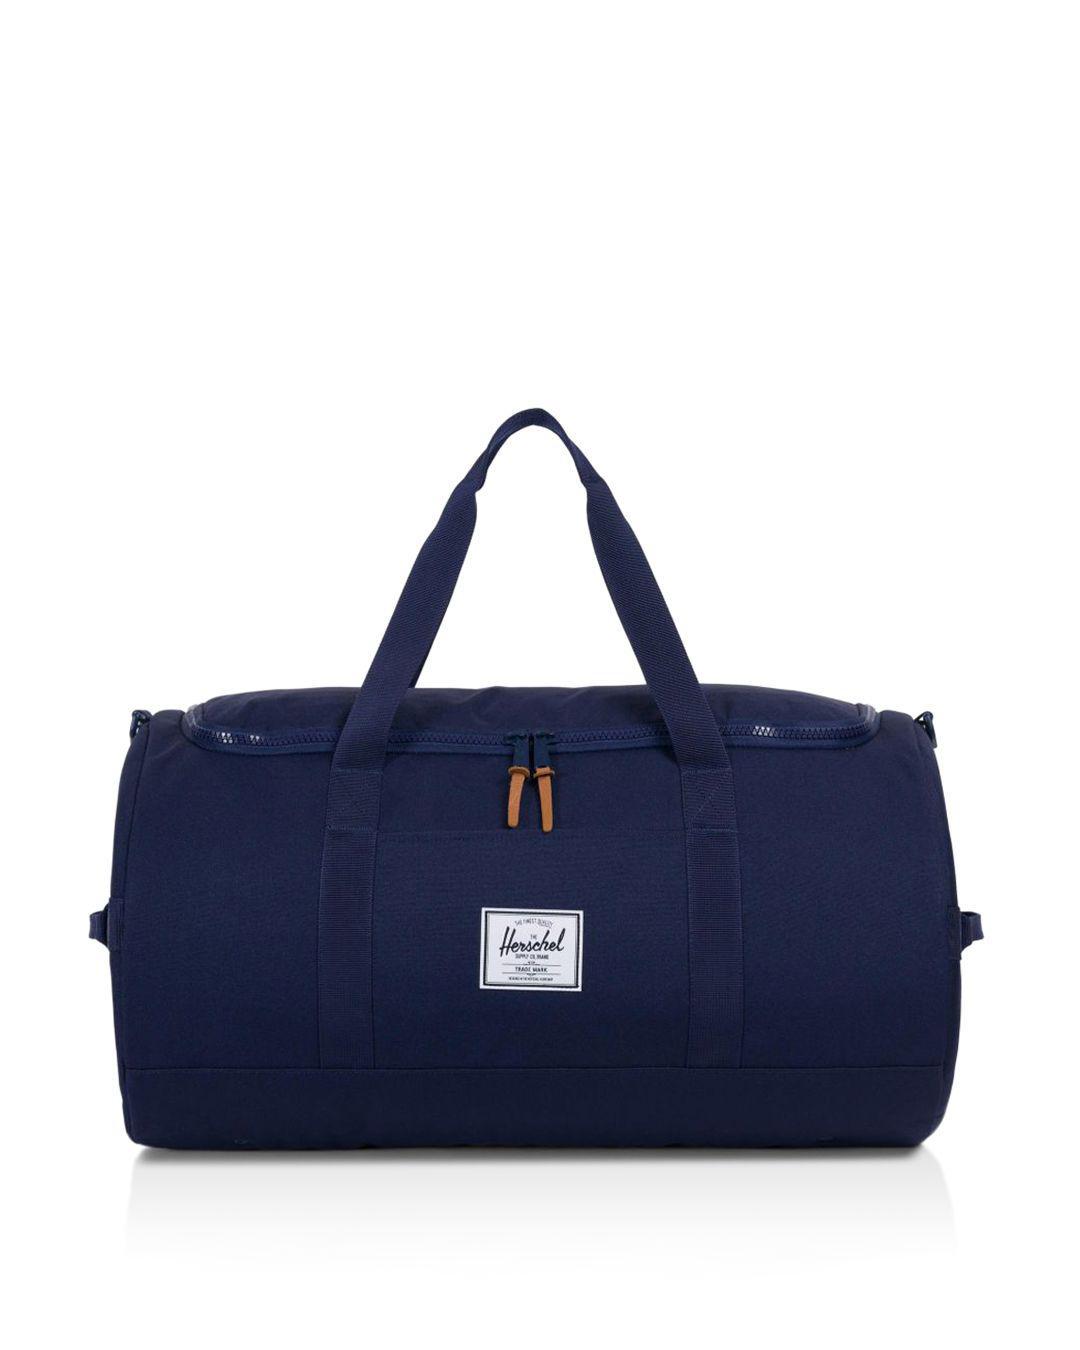 3476e46e59f0 Lyst - Herschel Supply Co. Sutton Duffle in Blue for Men